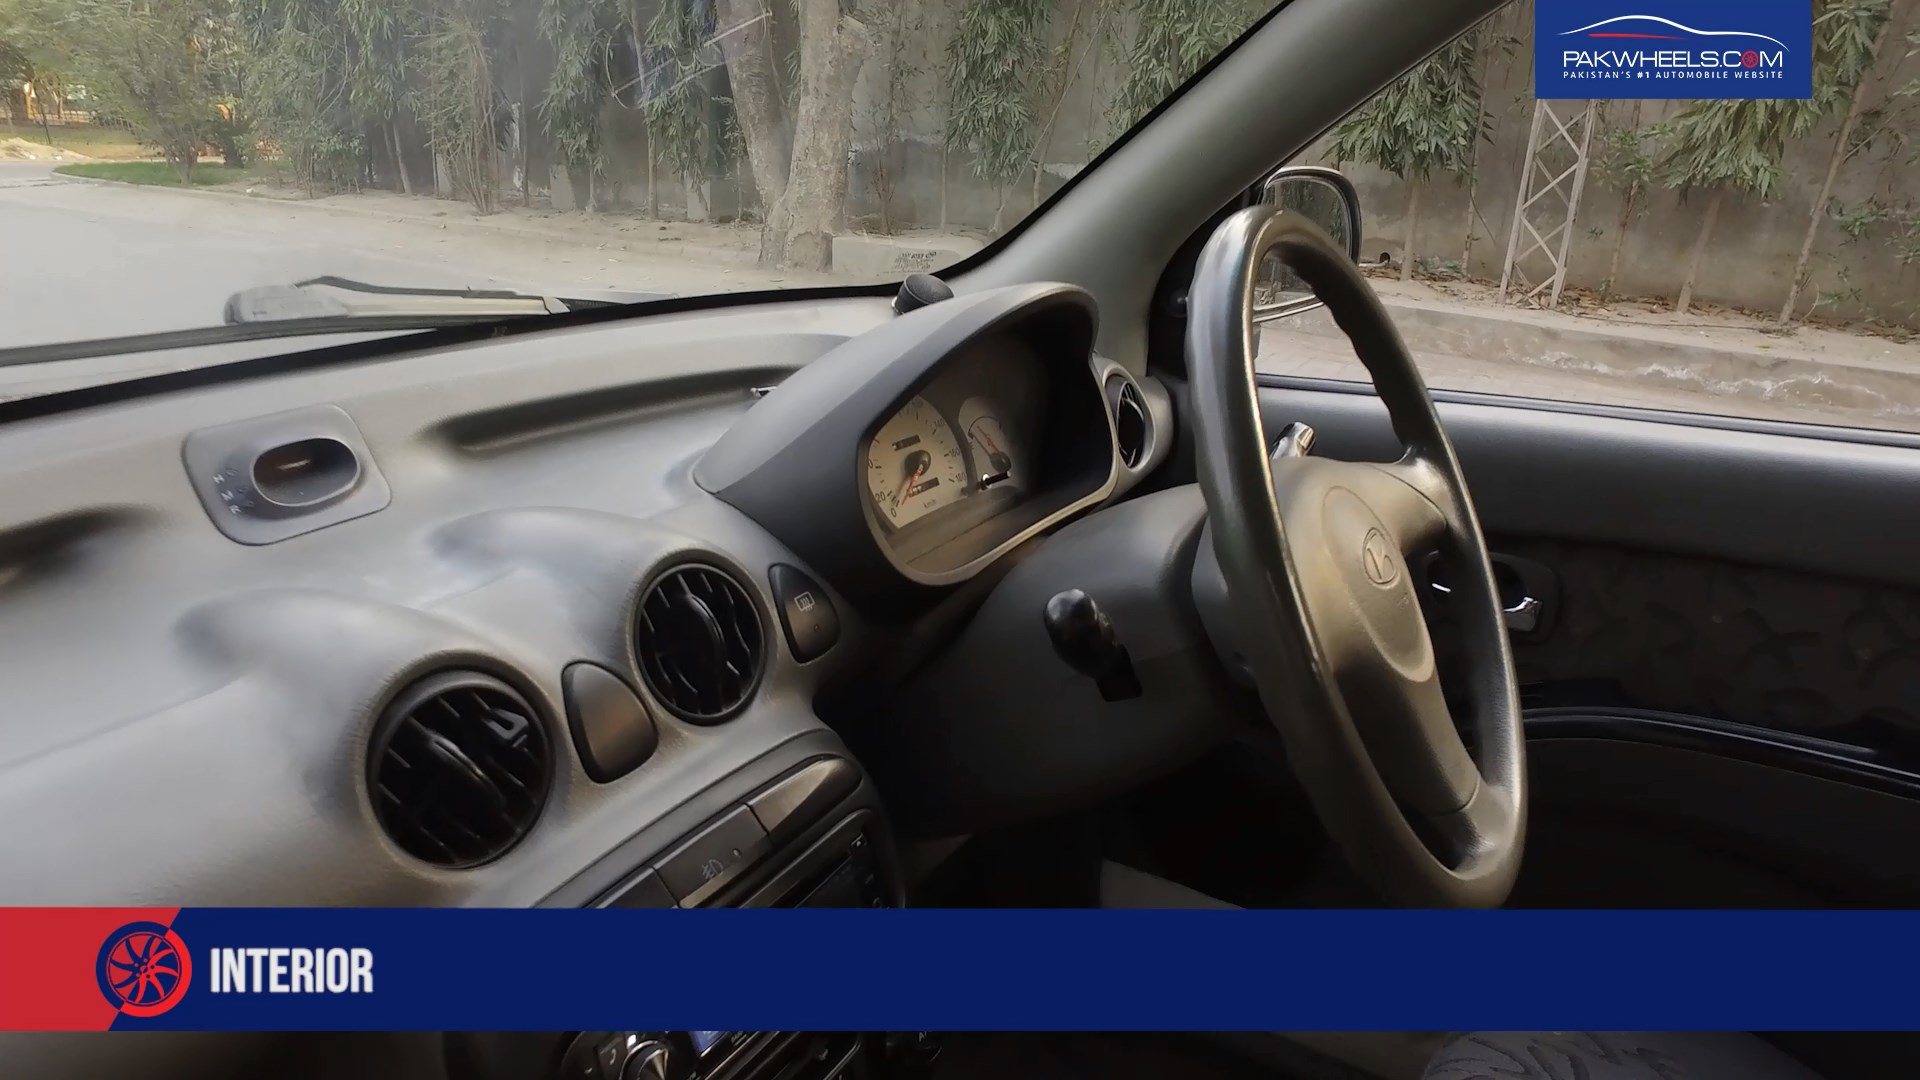 Hyundai Santro 2004 - PakWheels Budget Car Review (4)